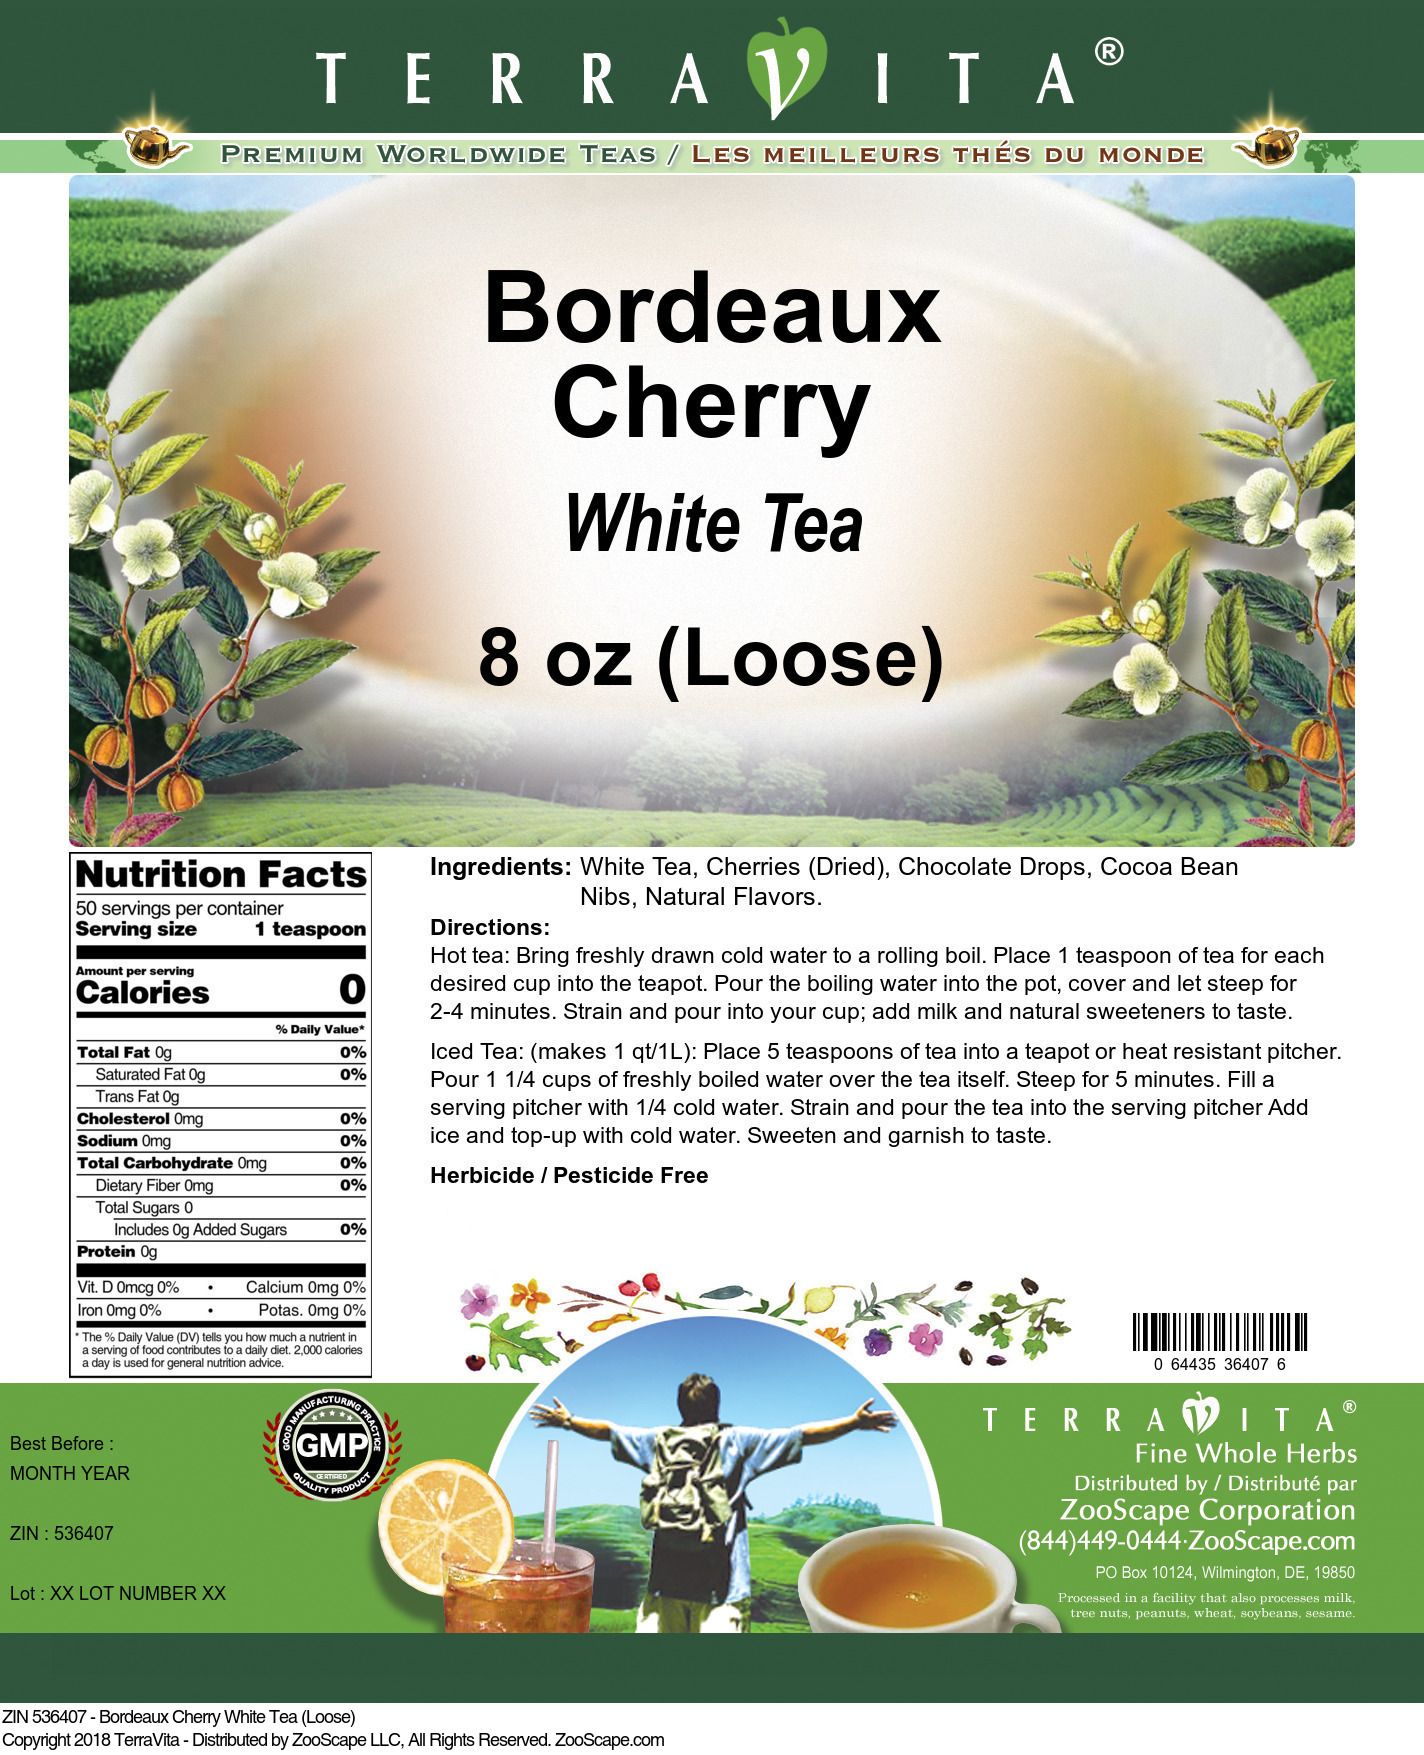 Bordeaux Cherry White Tea (Loose)